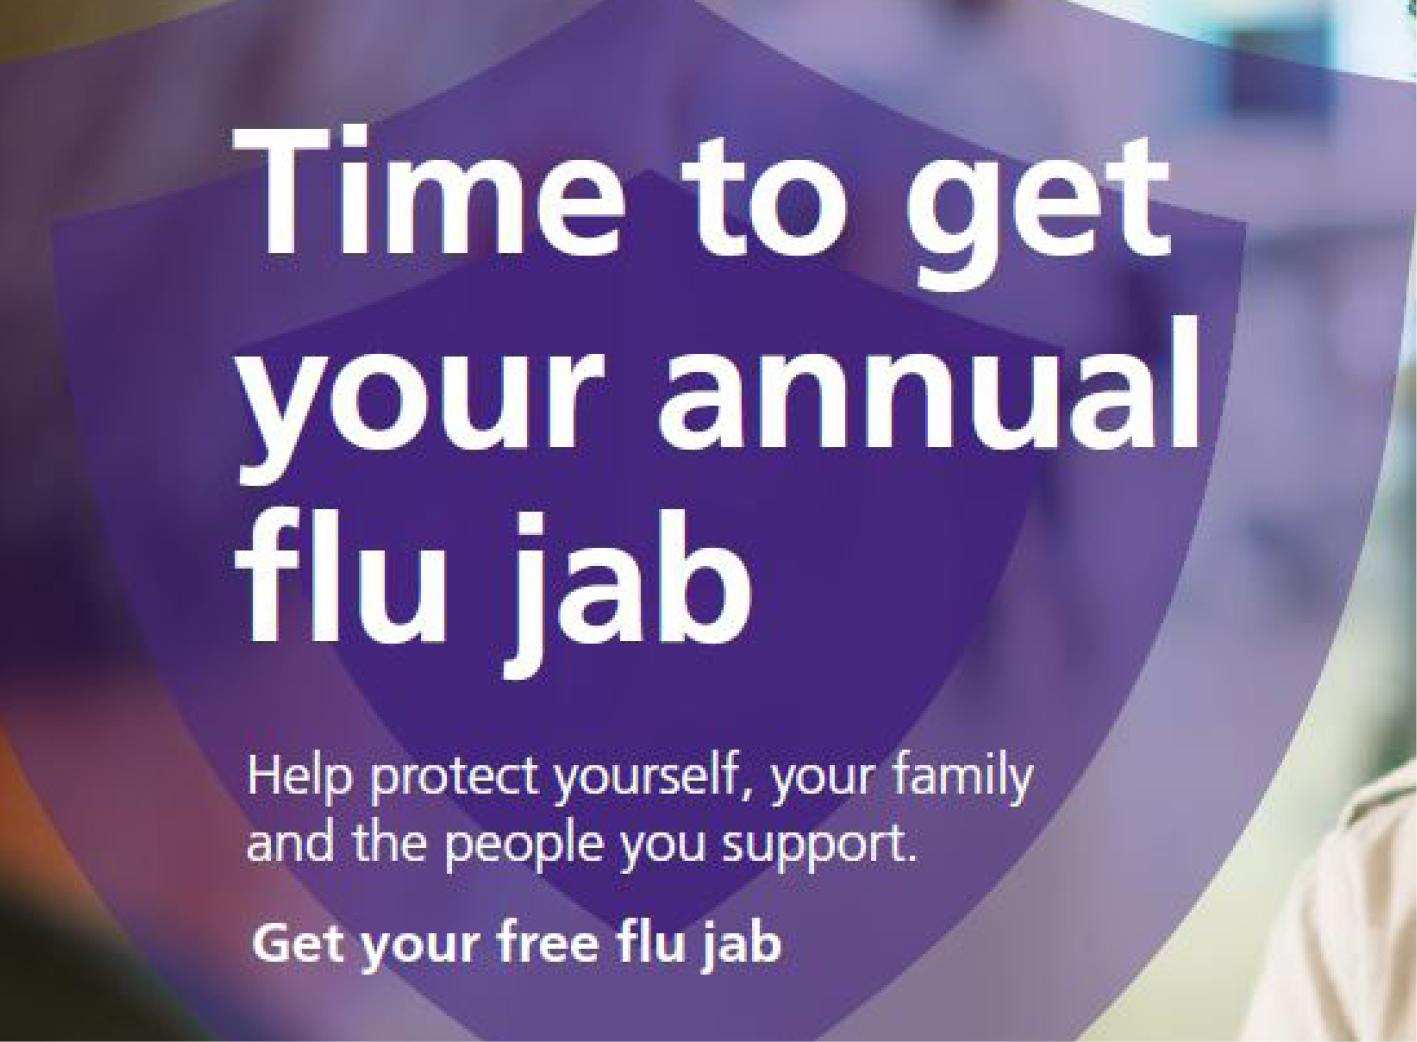 Get your FREE flu jab